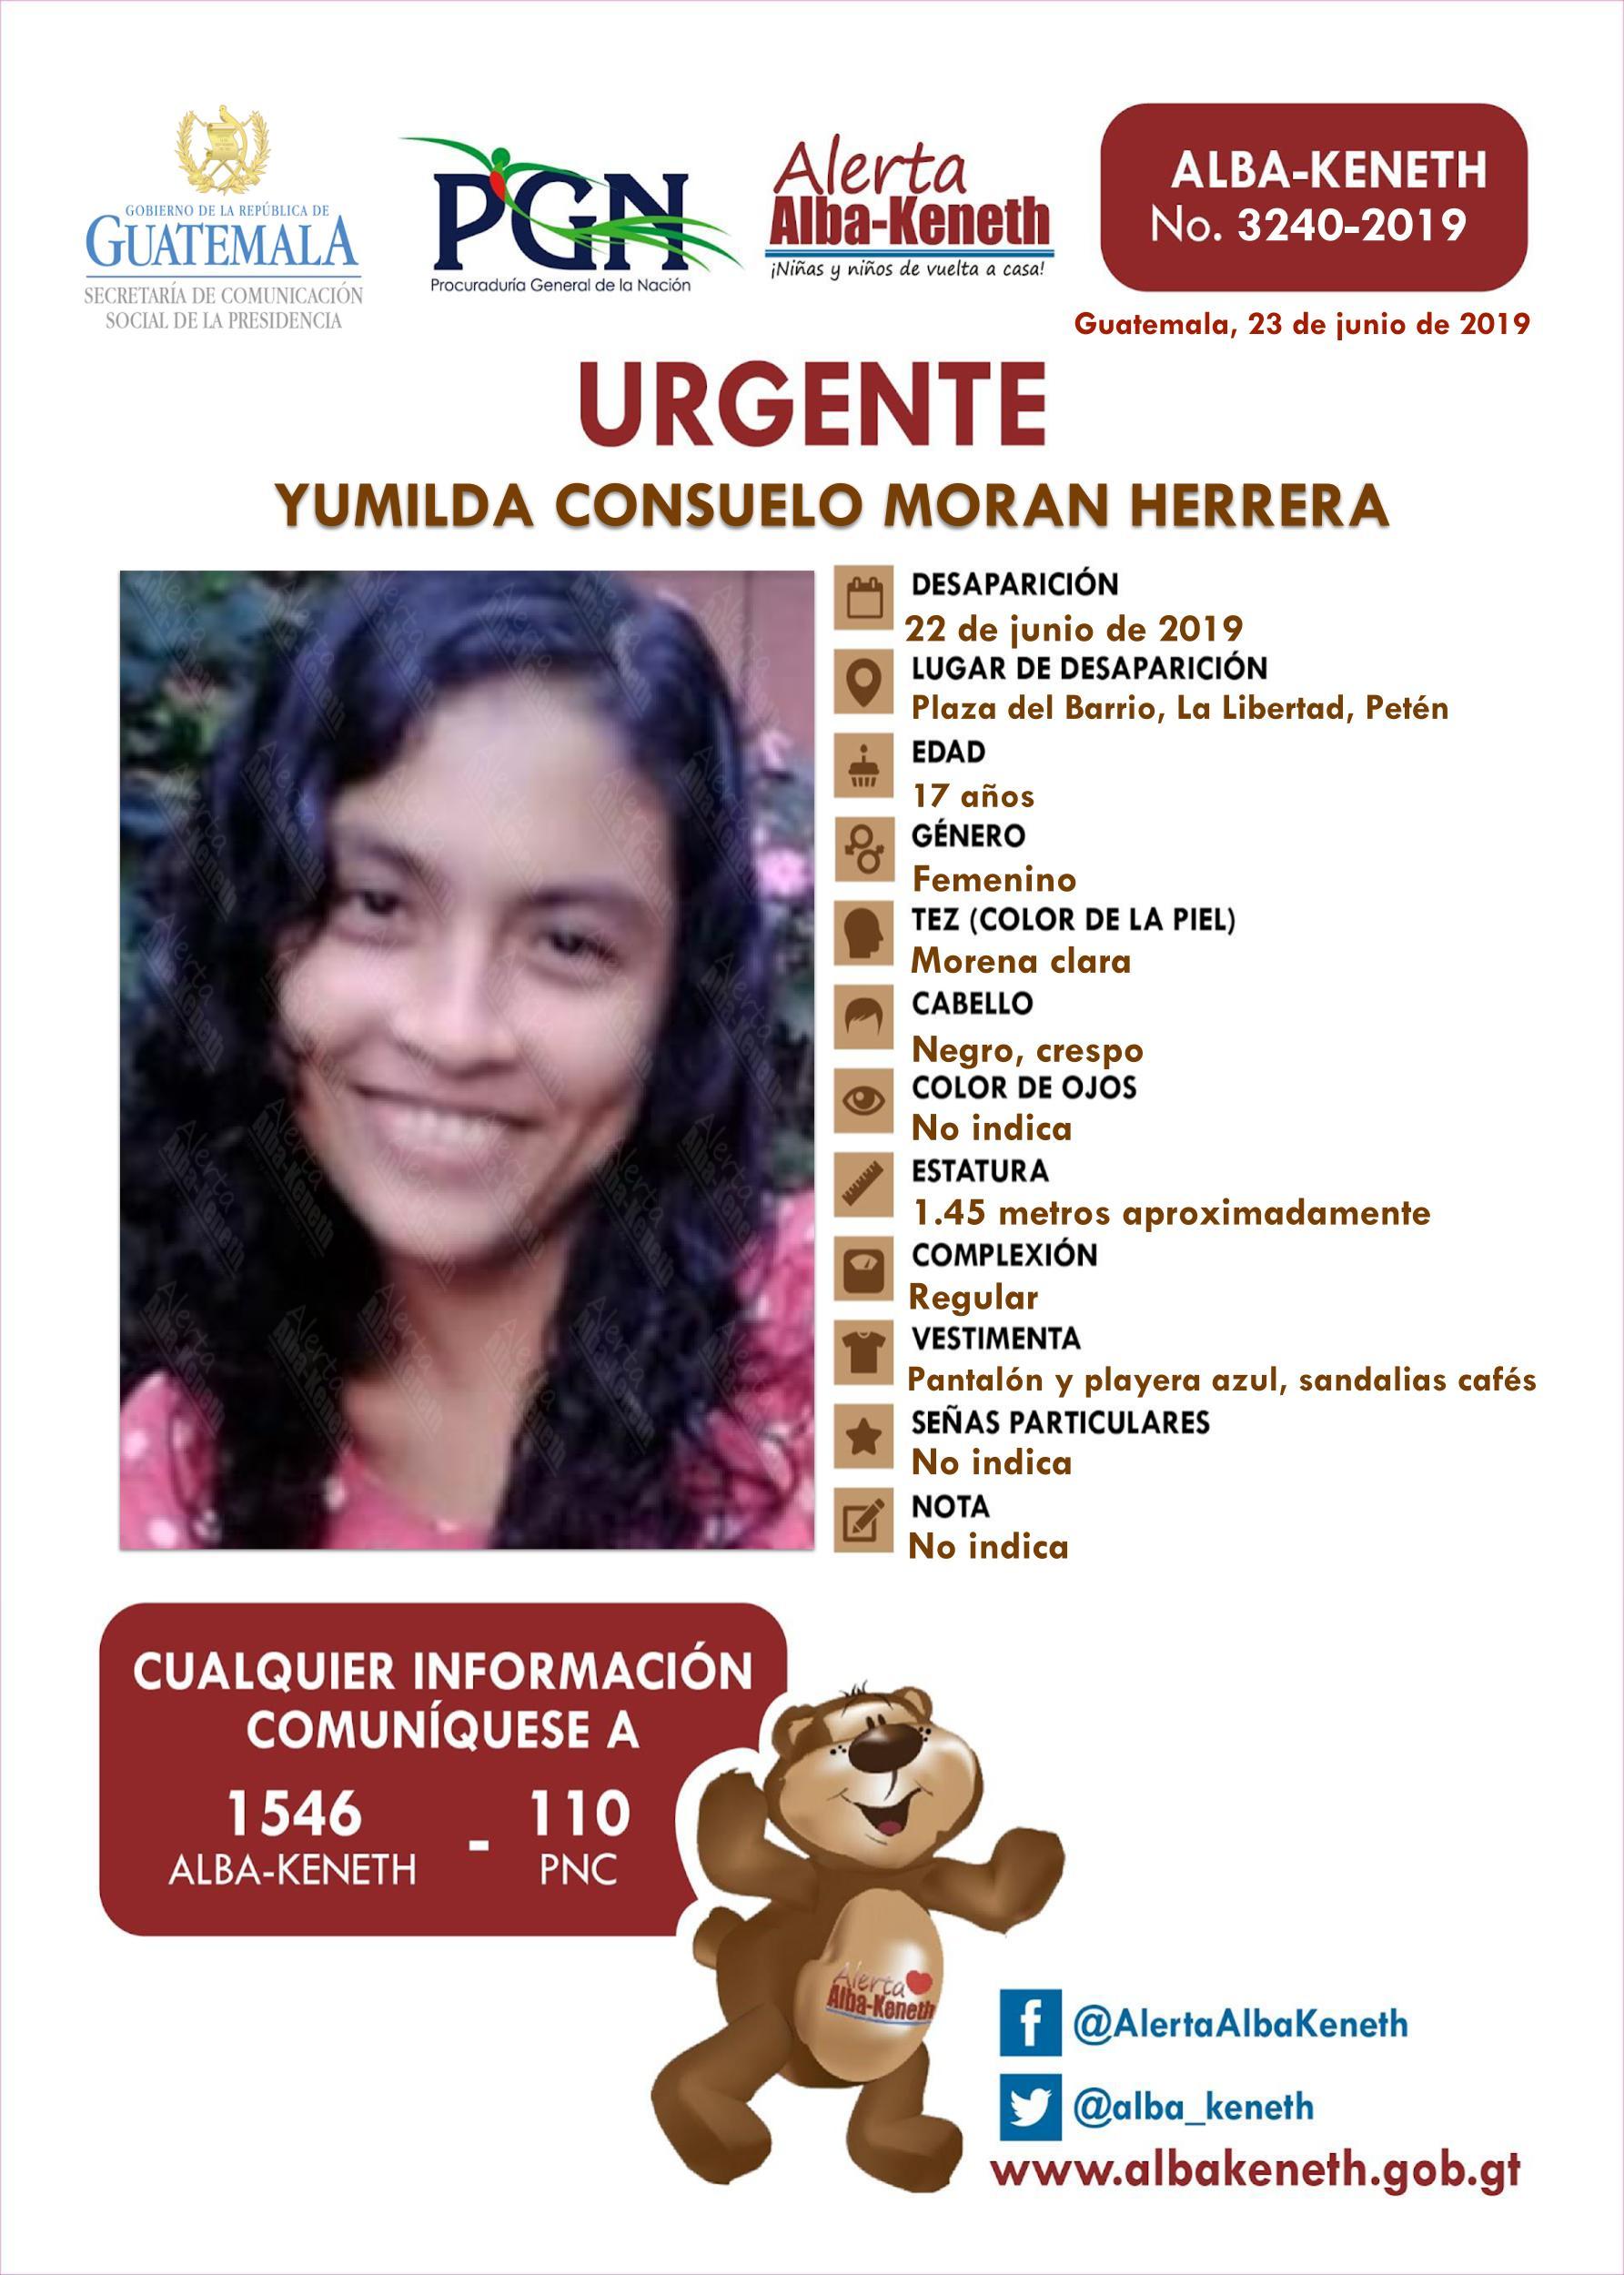 Yumilda Consuelo Moran Herrera